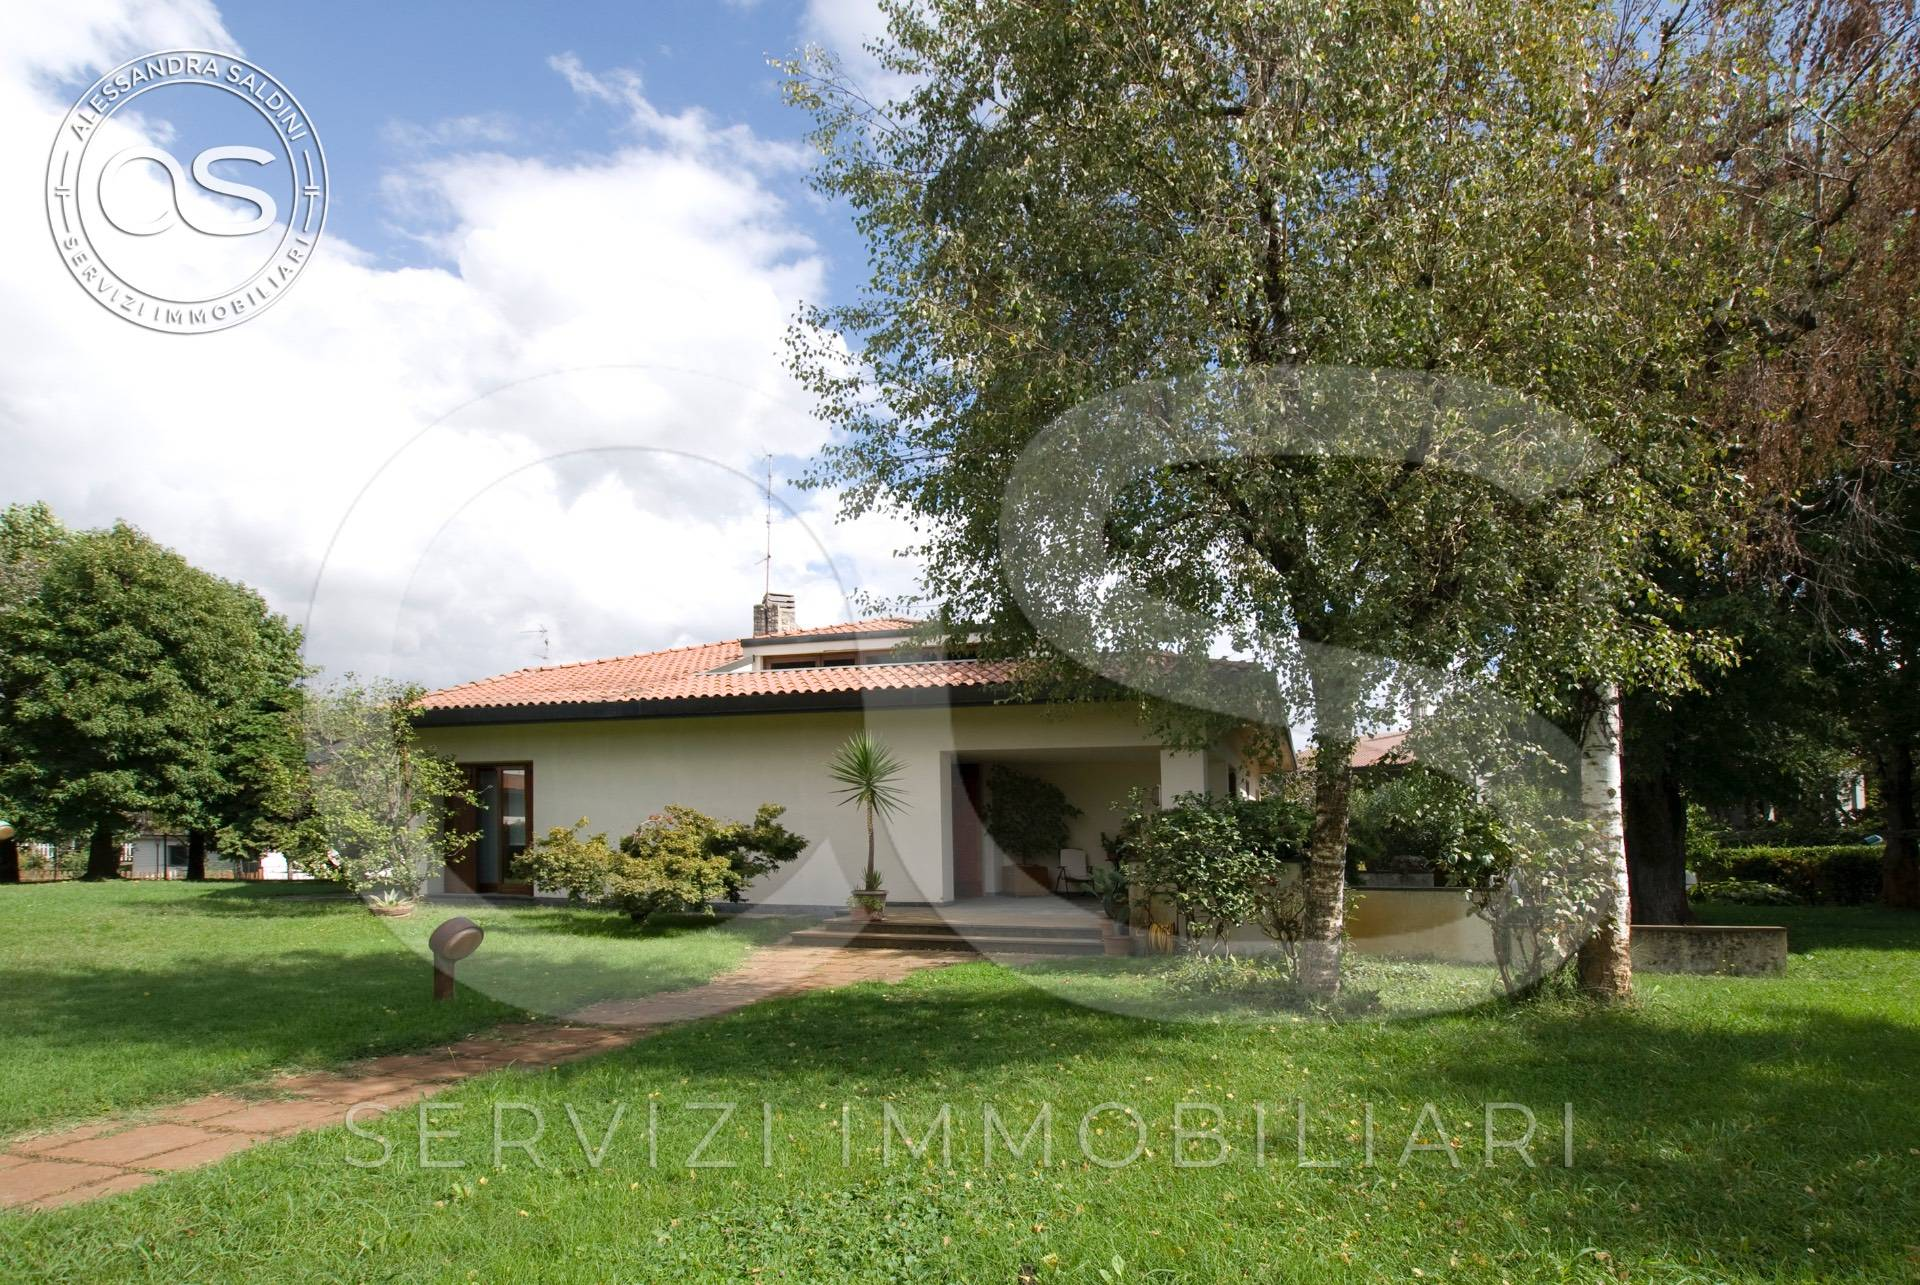 Vendita Villa unifamiliare Casa/Villa Manerbio 242253